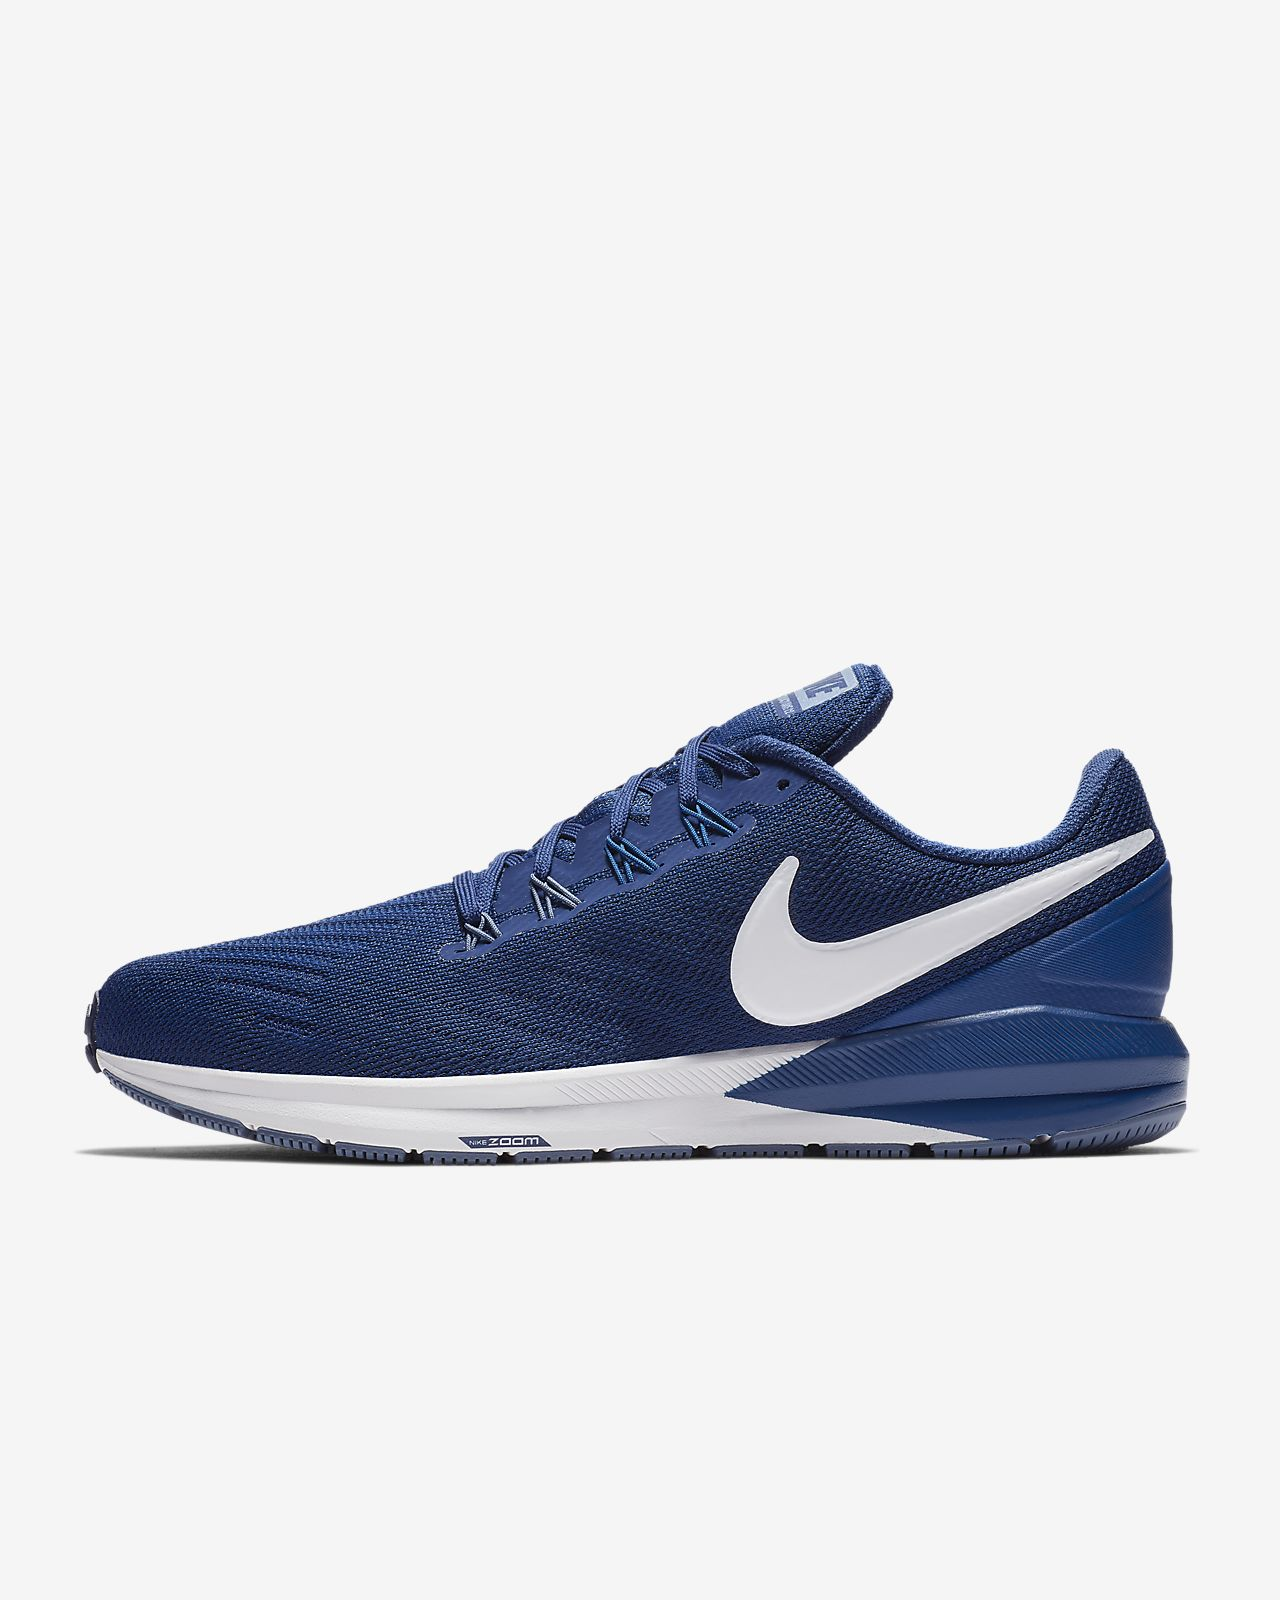 Nike De Pour Air 22 Structure Chaussure Running Zoom Hommelarge QBtshrdCxo